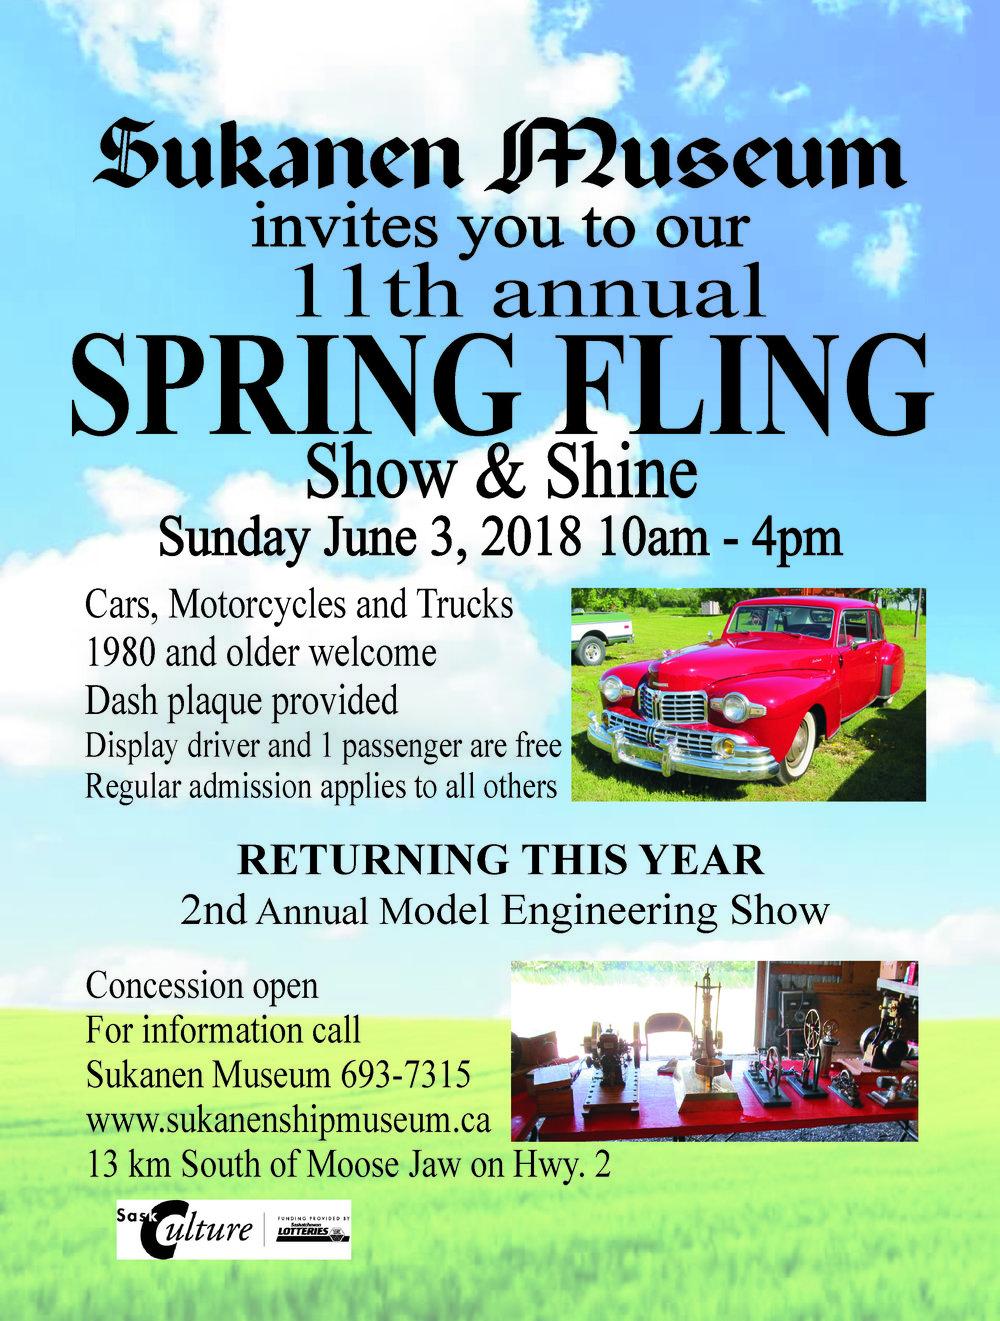 Sukanen Museum Th Annual Spring Fling Tourism Moose Jaw - Car show dash plaque display